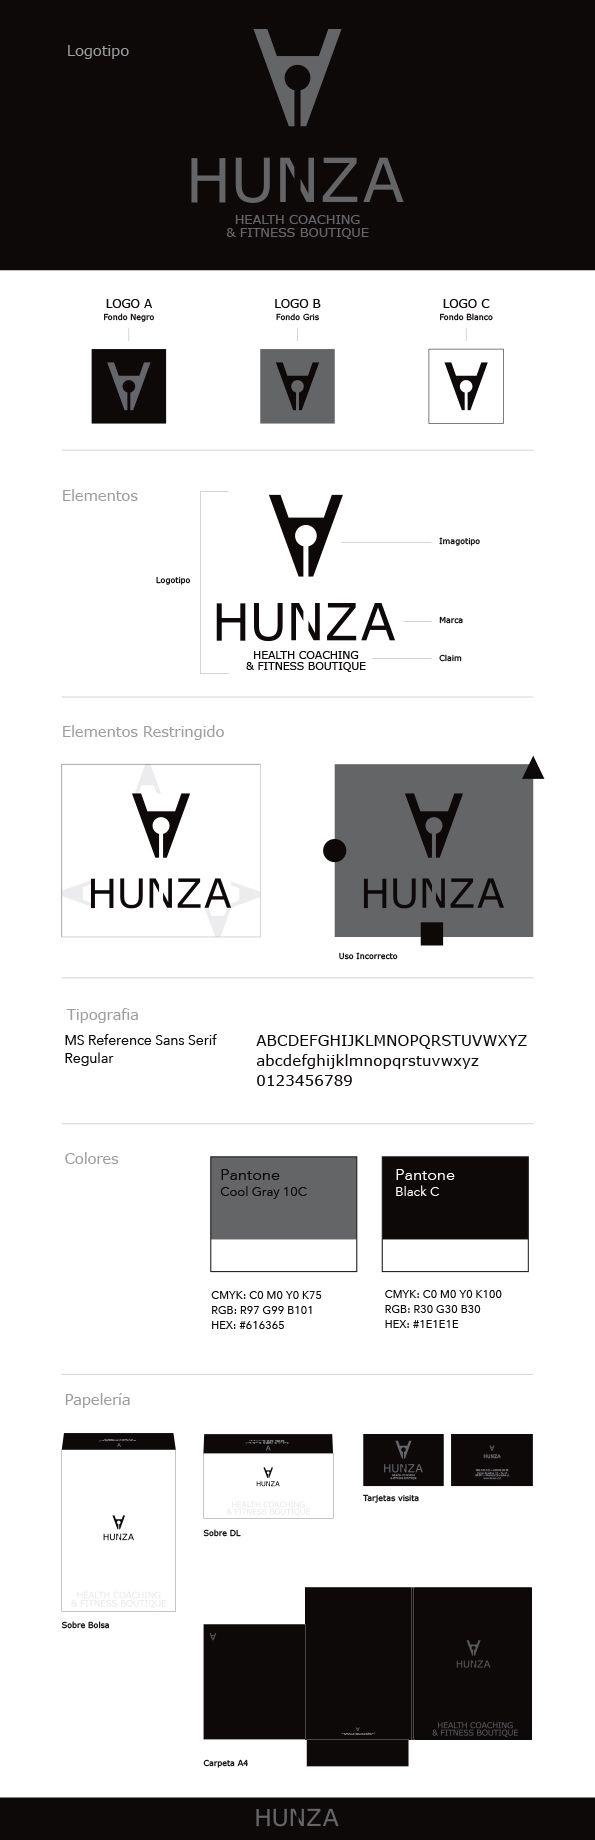 MIC para HUNZA, health coaching & fitness boutique